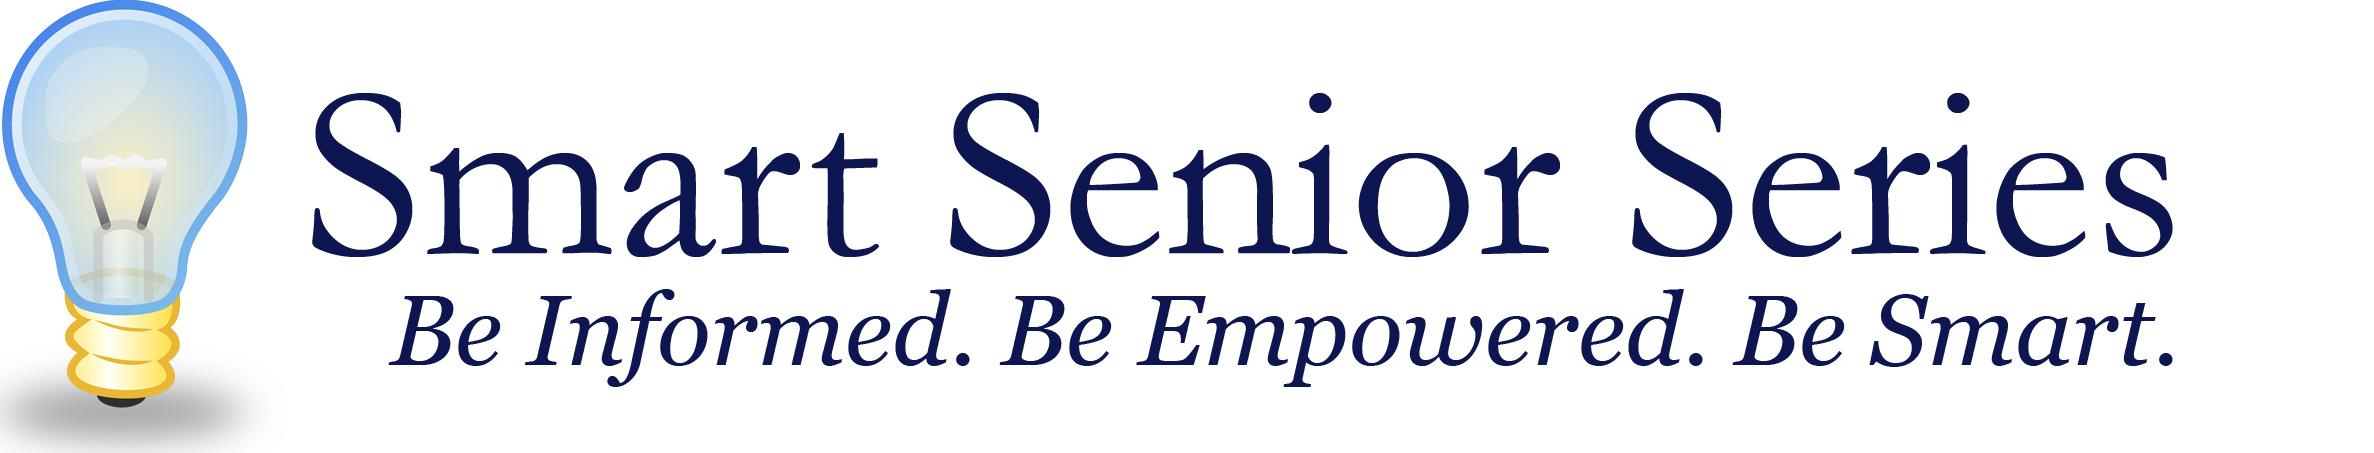 Smart Senior Series